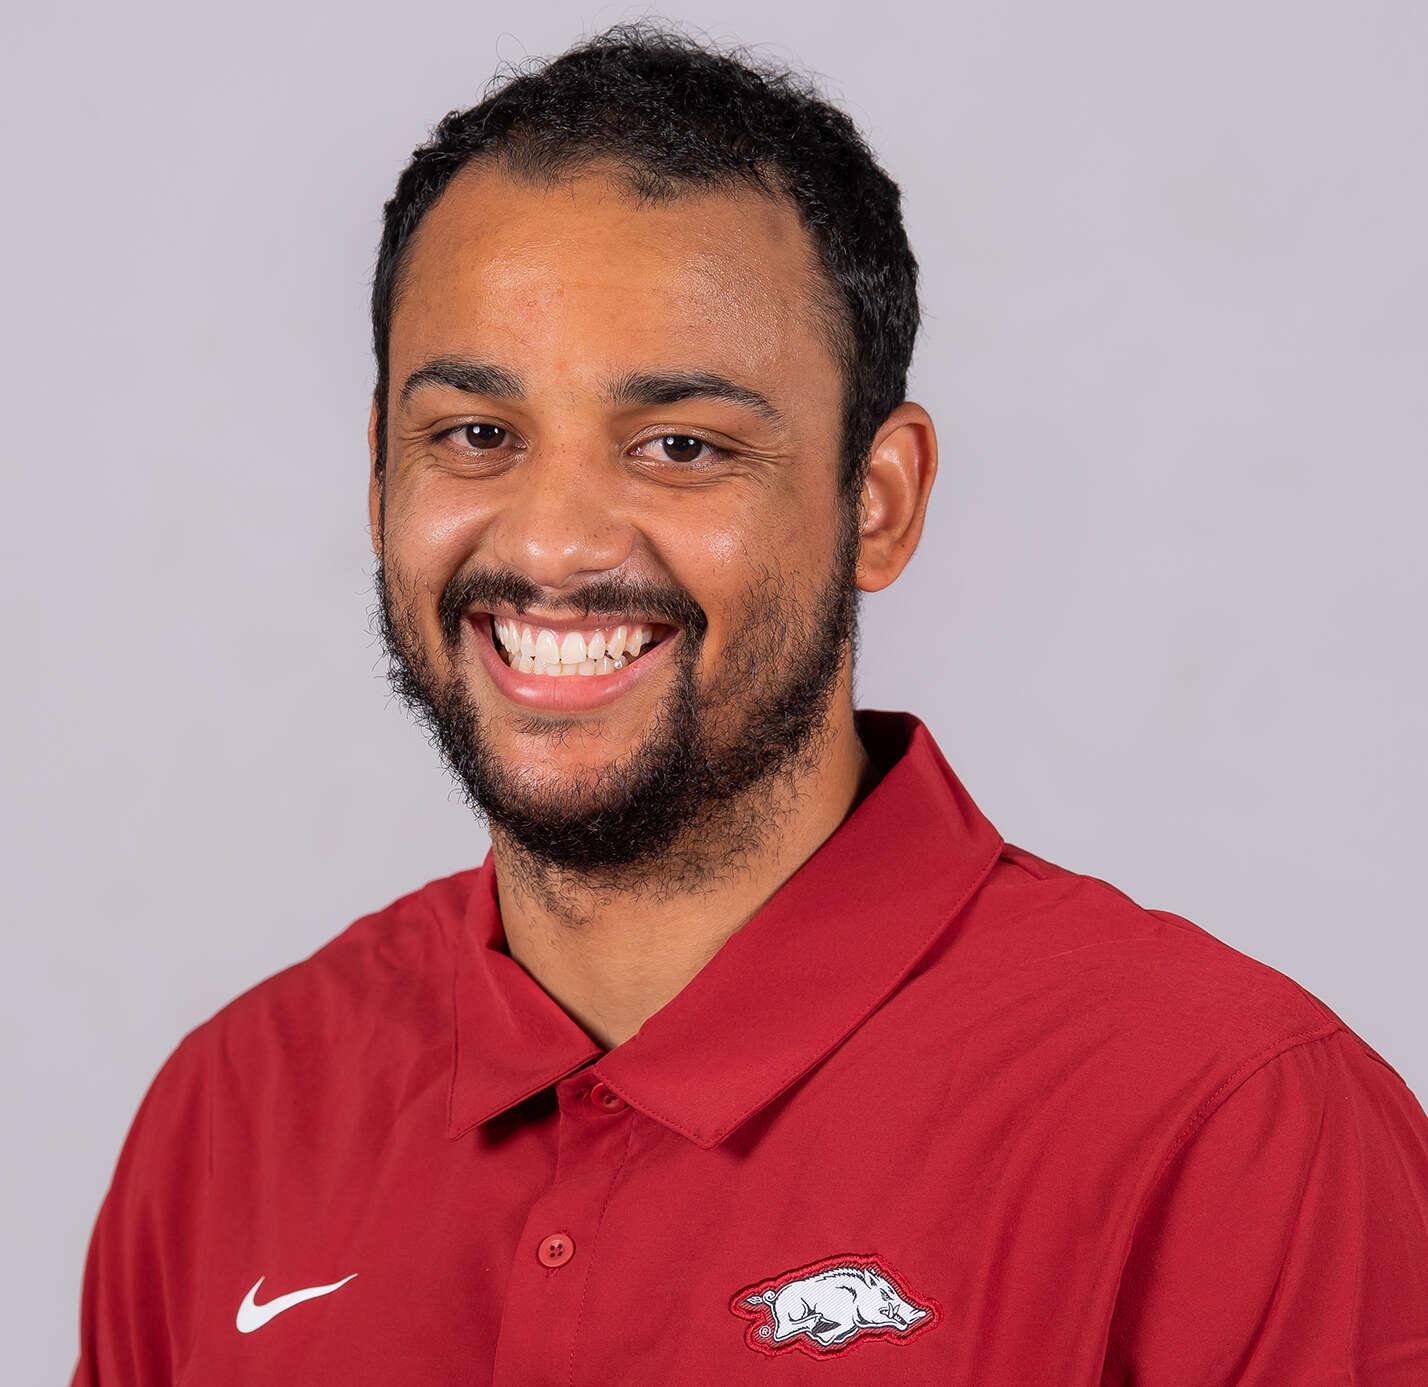 Raheem Martin - Men's Basketball - Arkansas Razorbacks